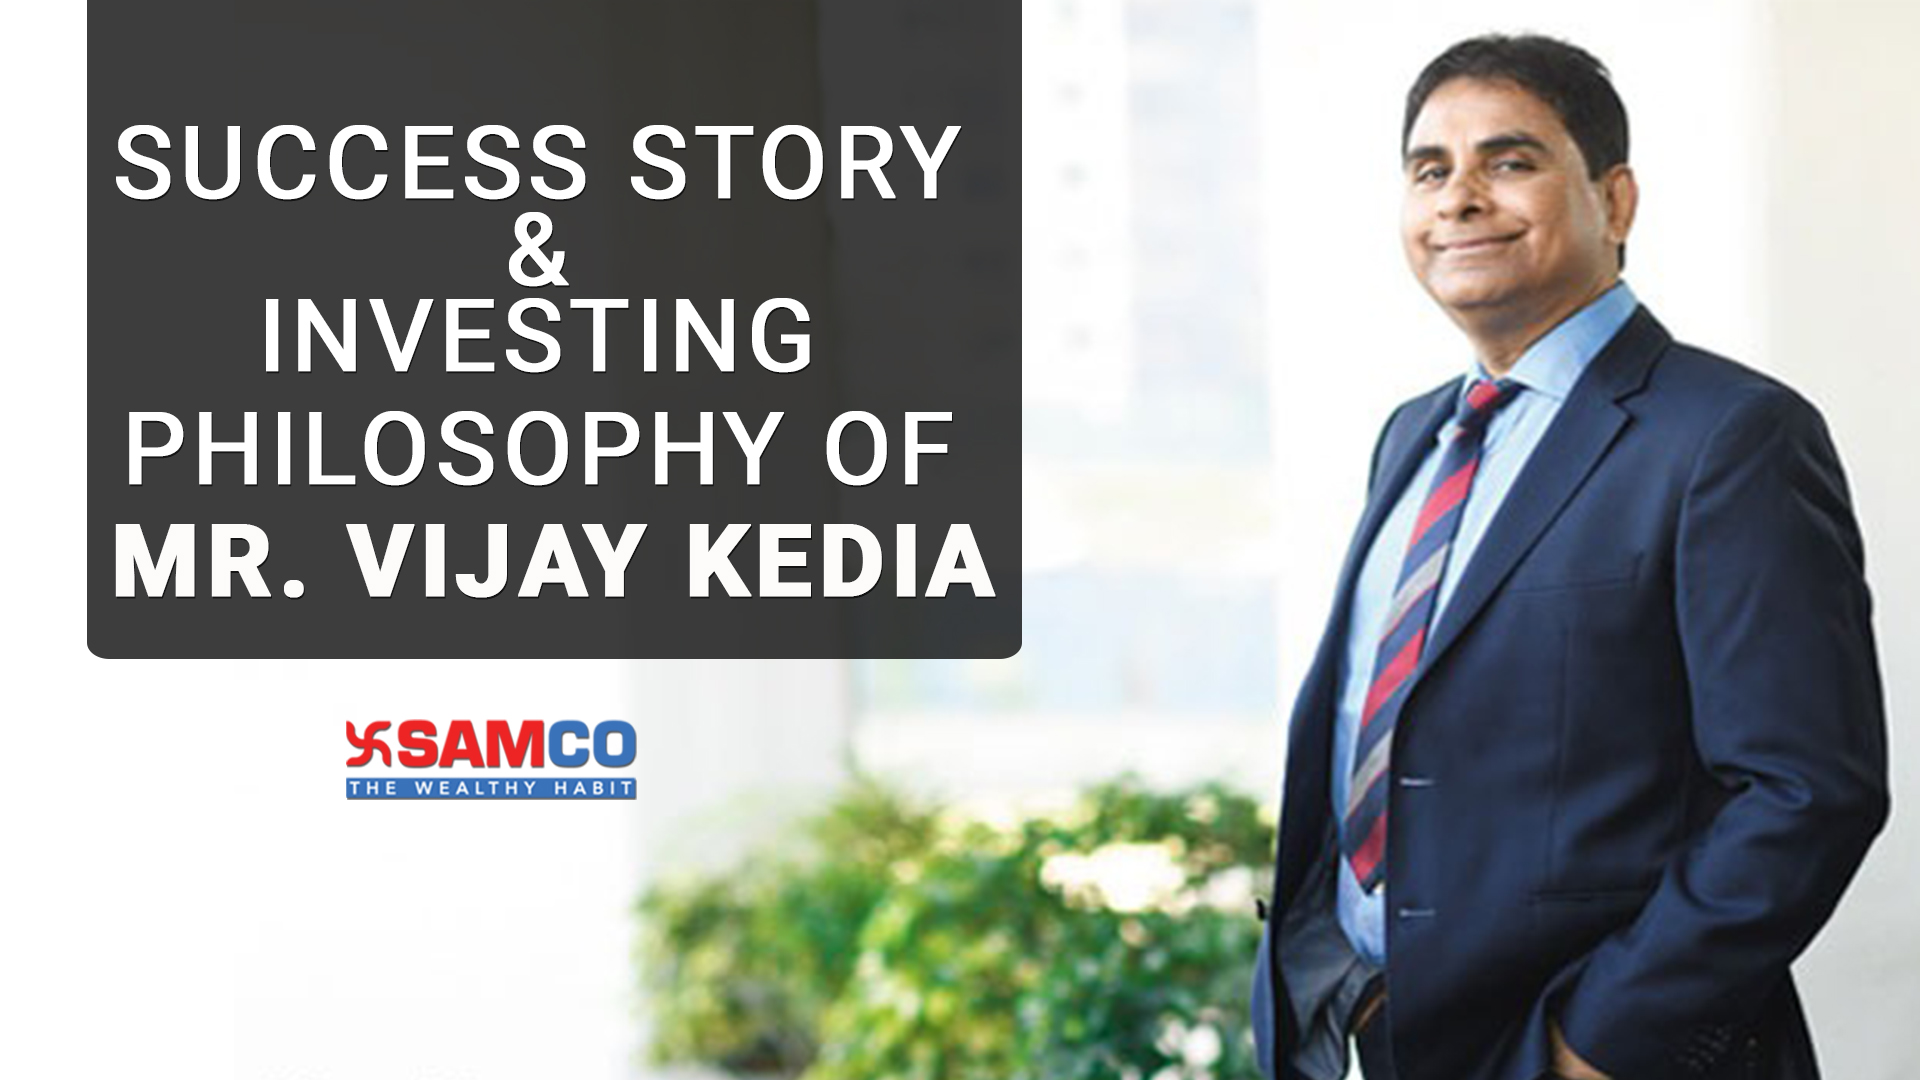 Success Story and Investing Philosophy of Mr. Vijay Kedia